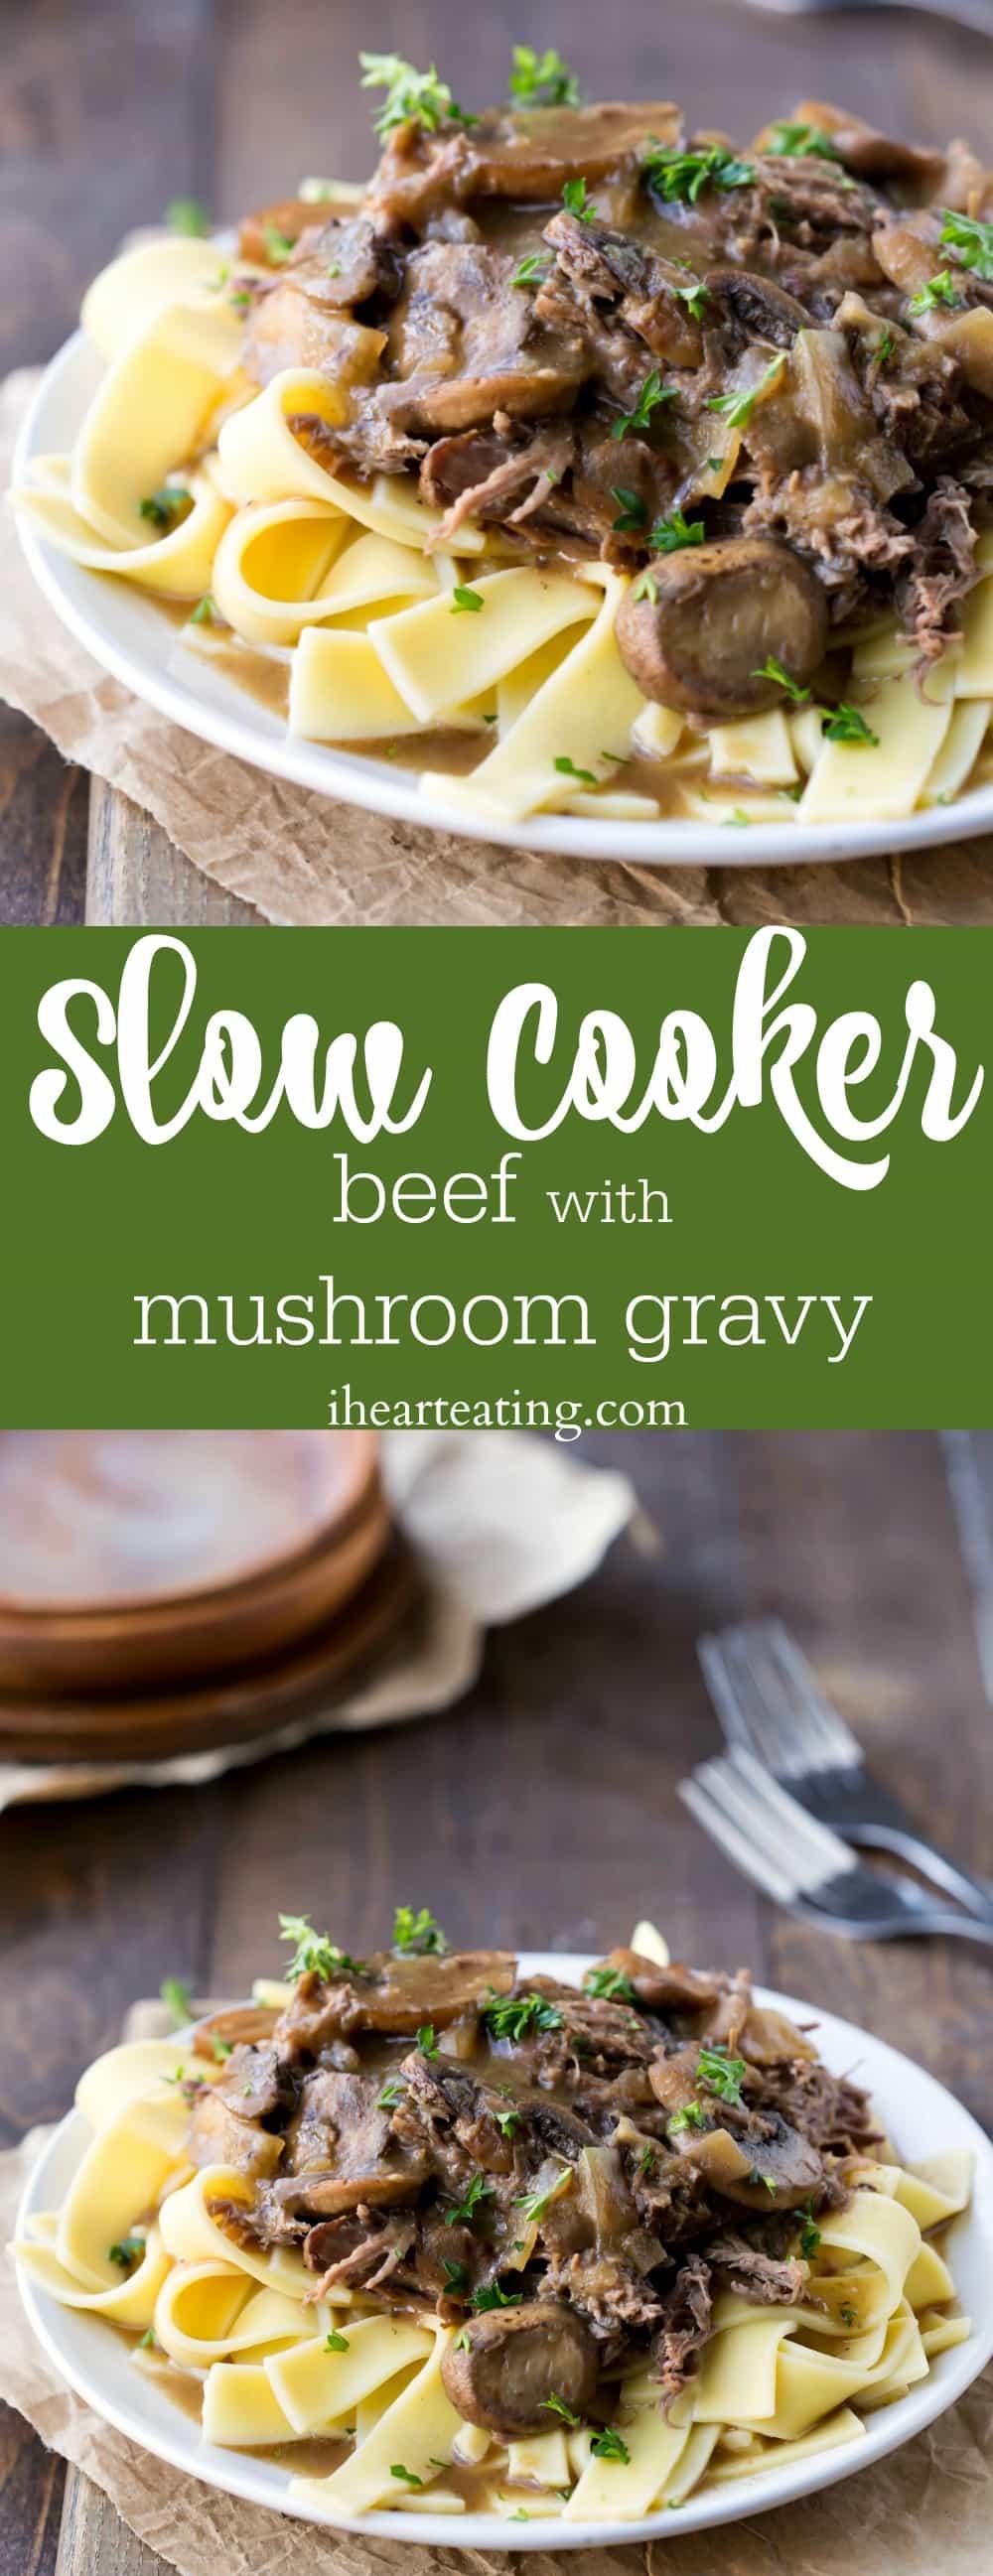 Slow Cooker Beef with Mushroom Gravy